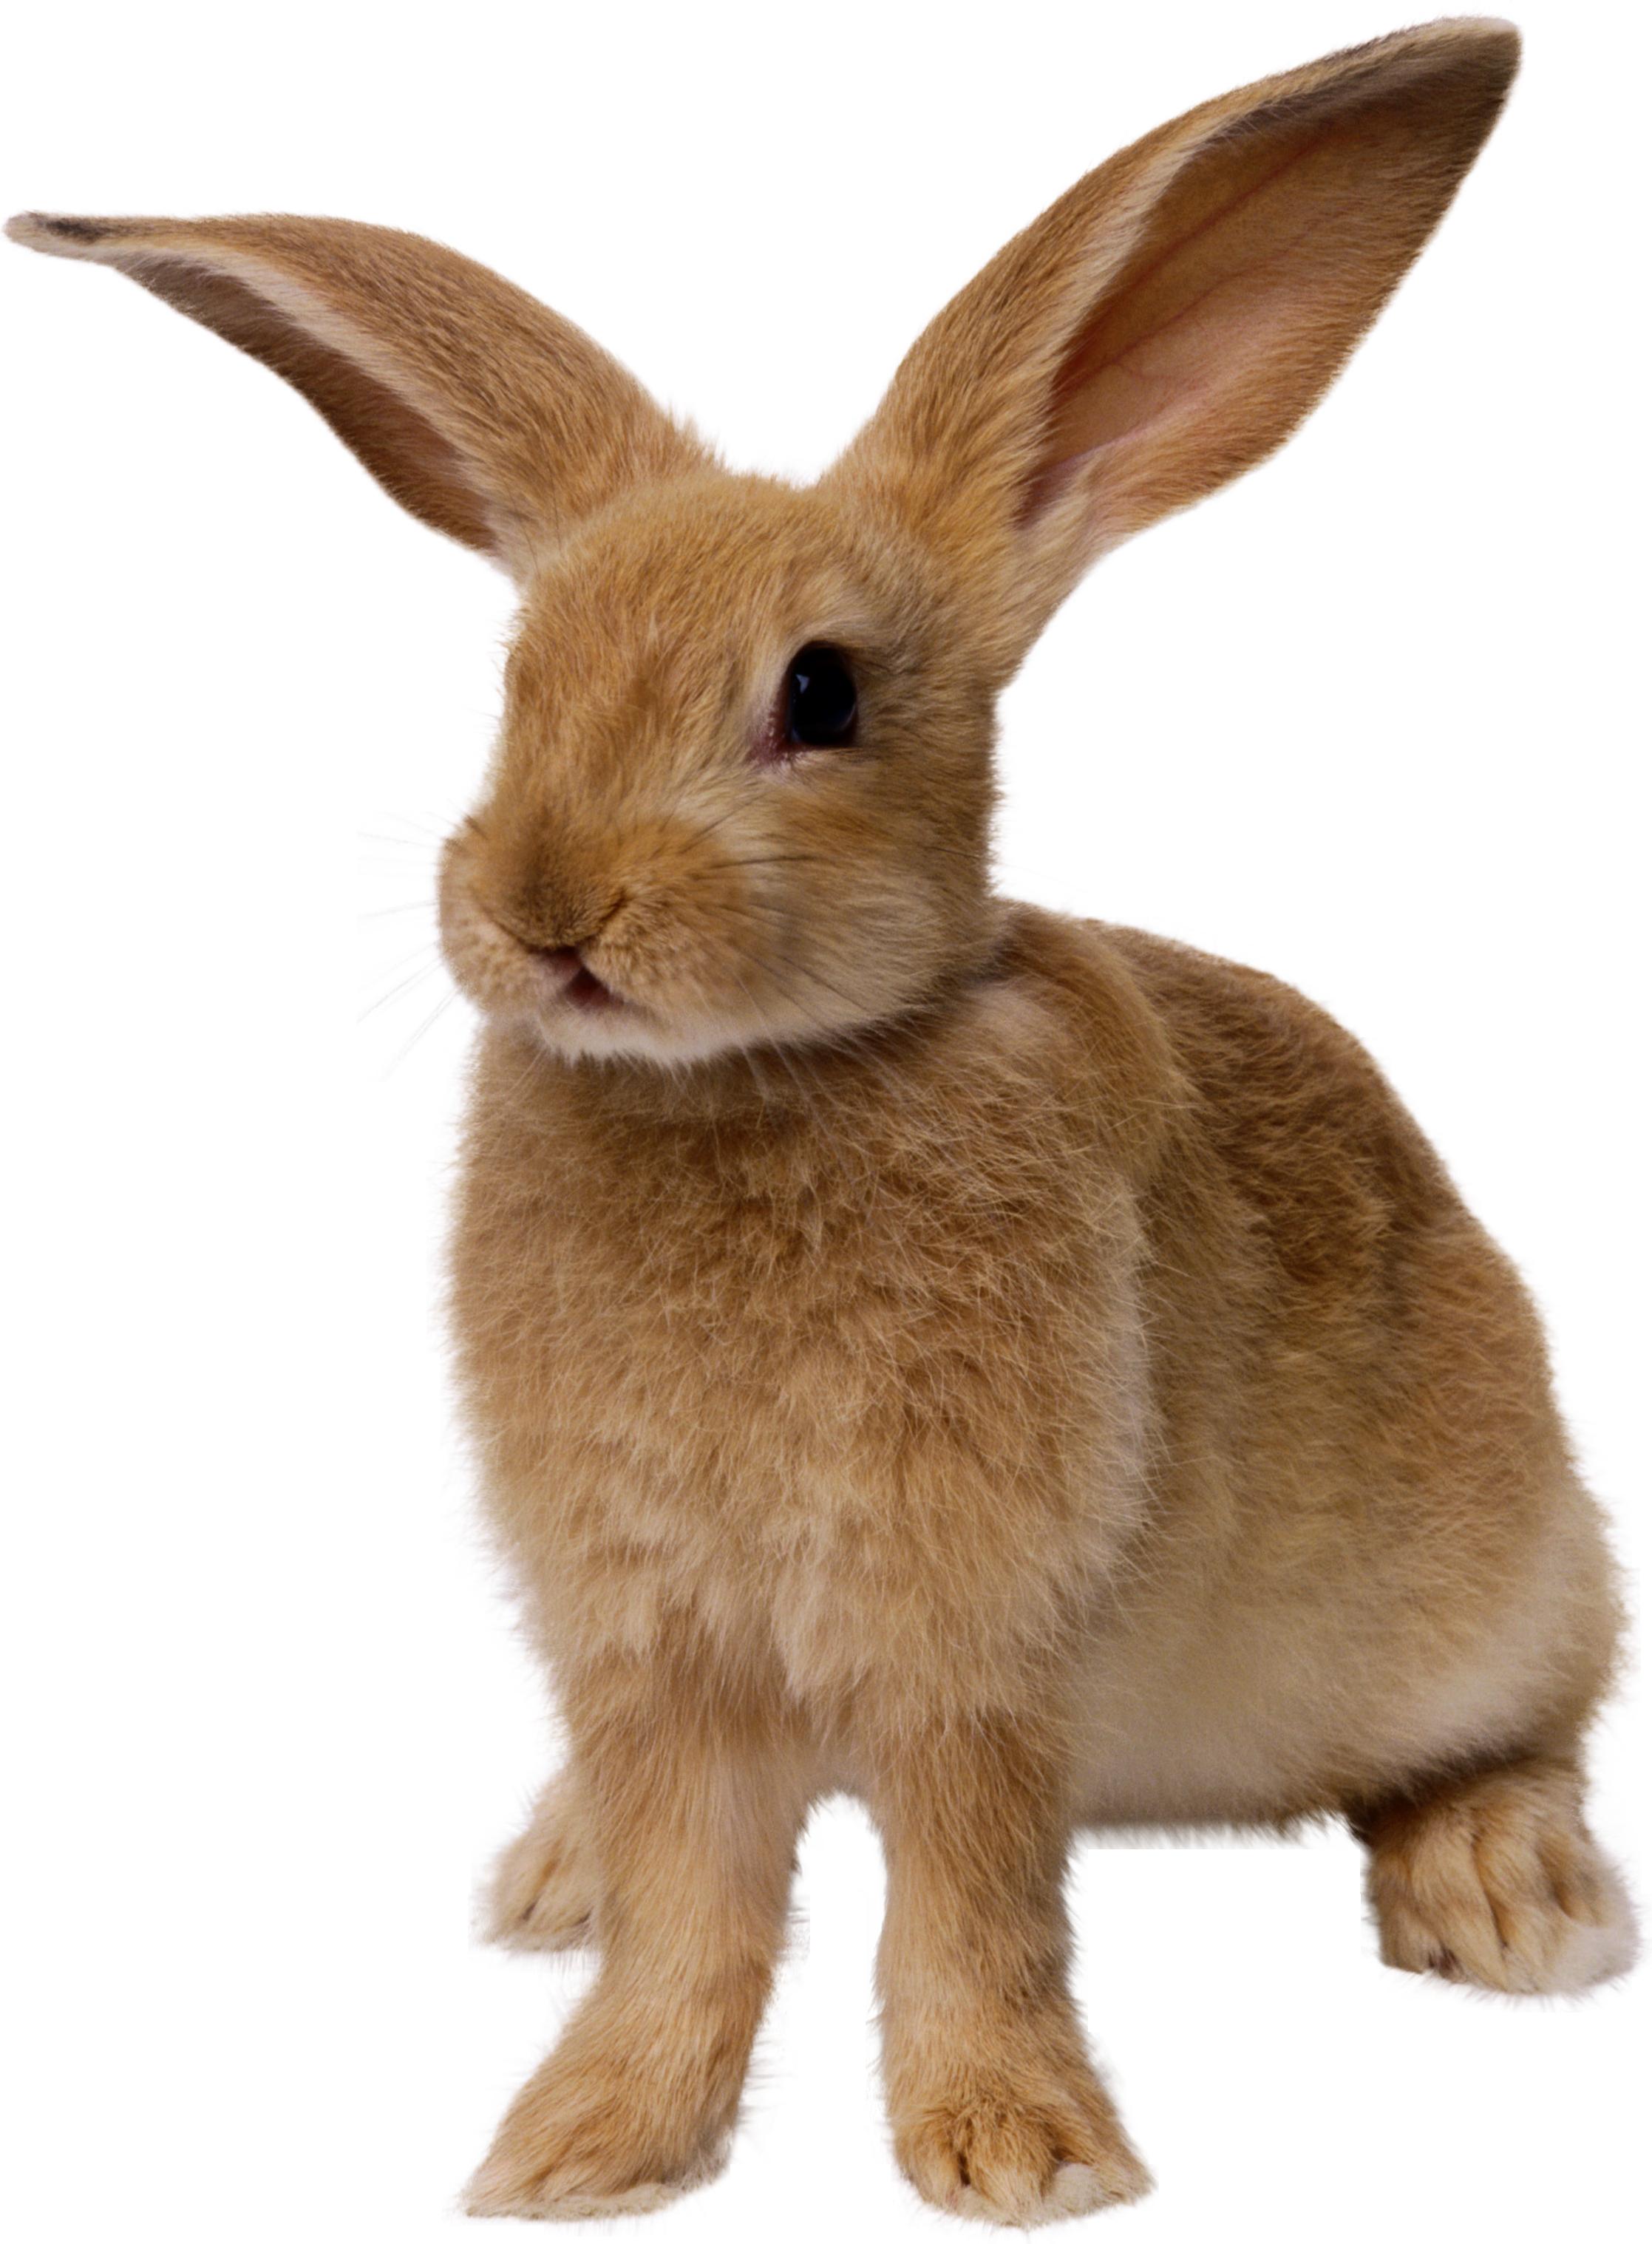 Bunny PNG Transparent Bunny.PNG Images.   PlusPNG